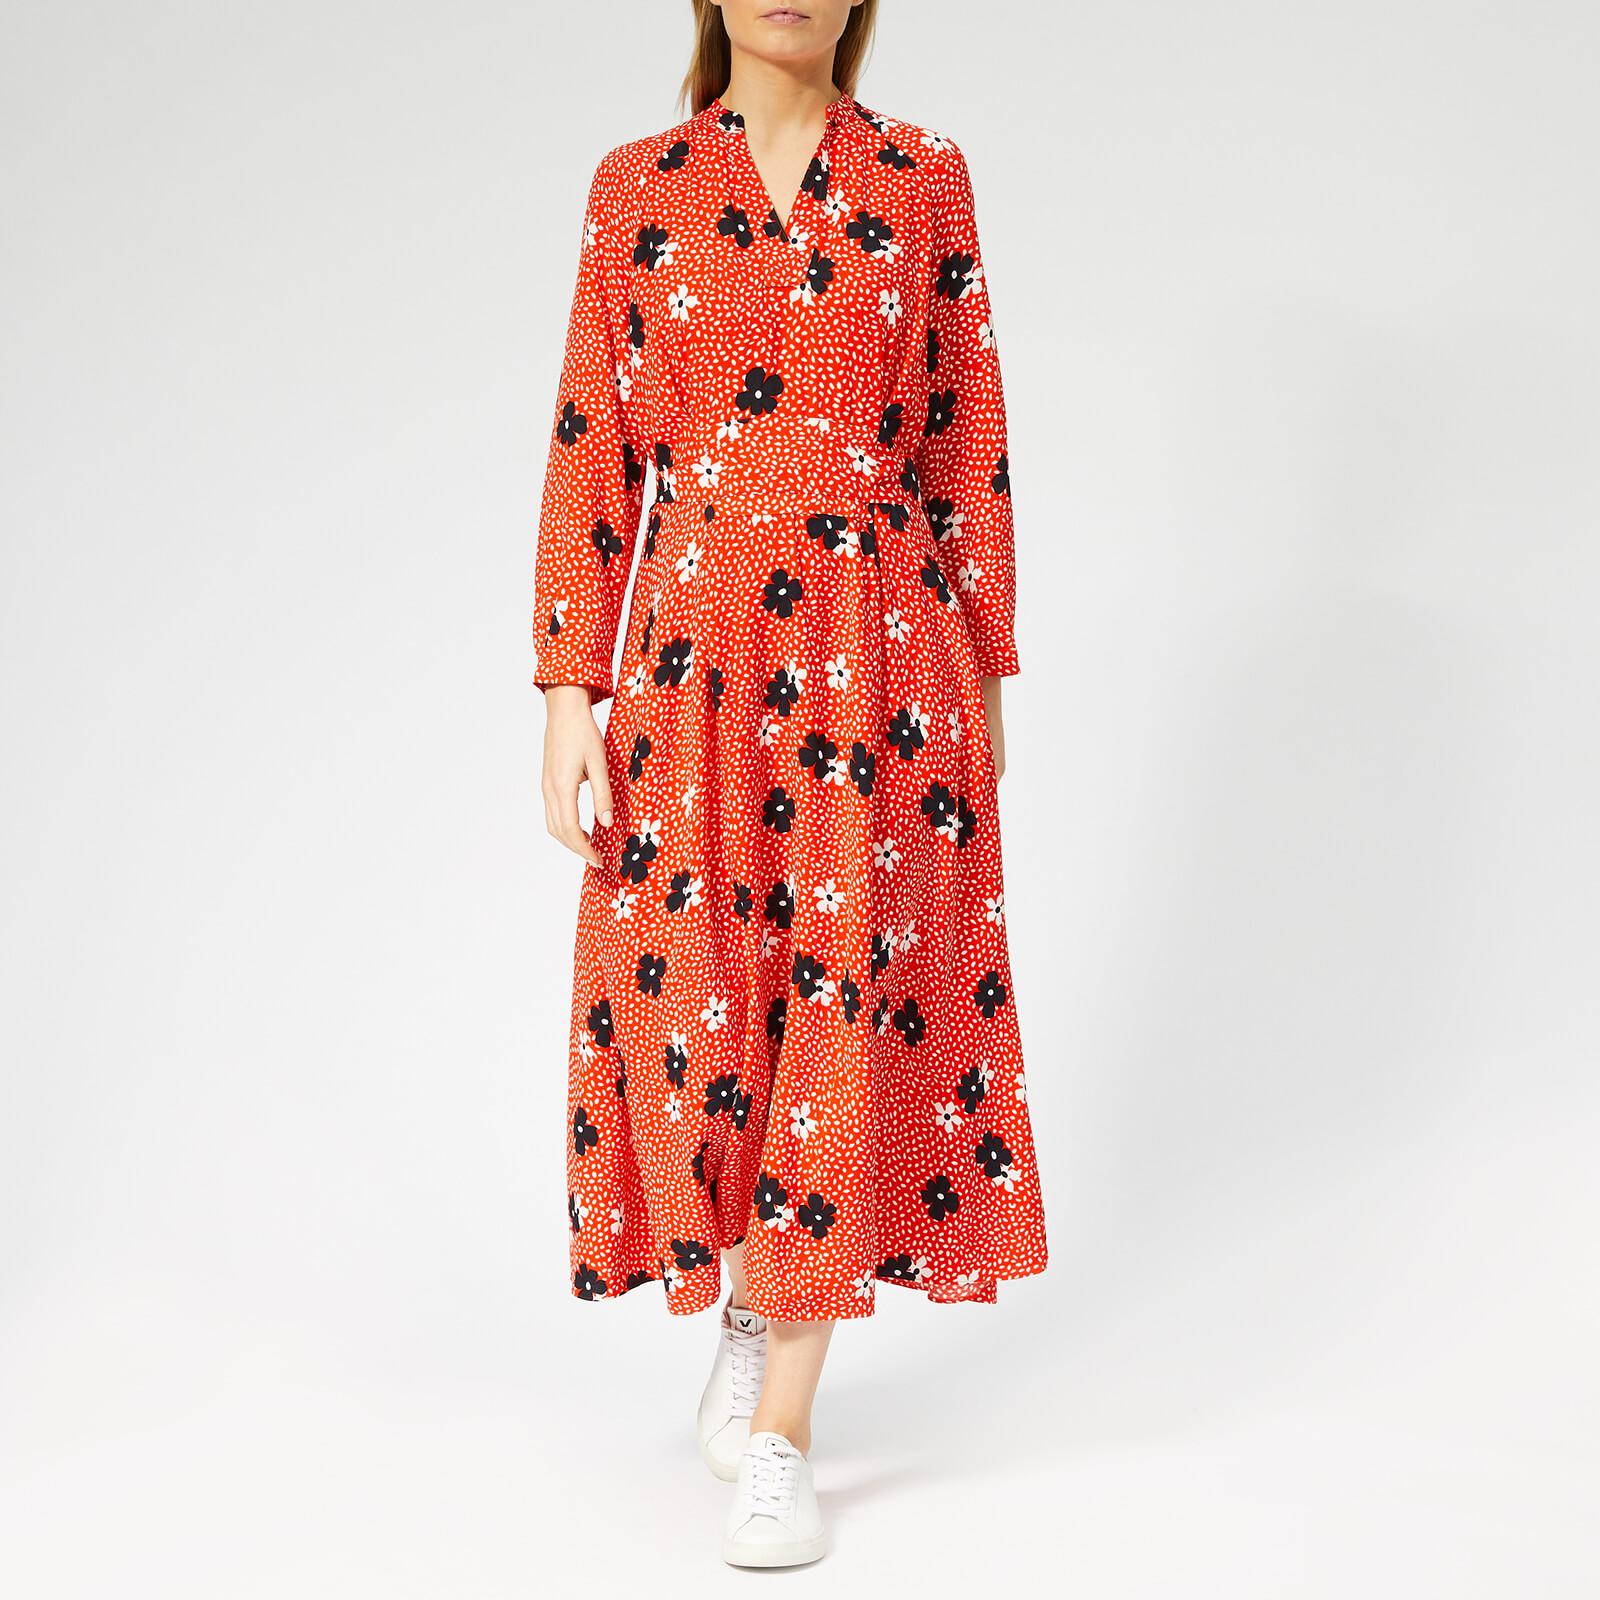 0445efe41 Whistles Women's Confetti Floral Print Midi Dress - Red/Multi Womens  Clothing | TheHut.com